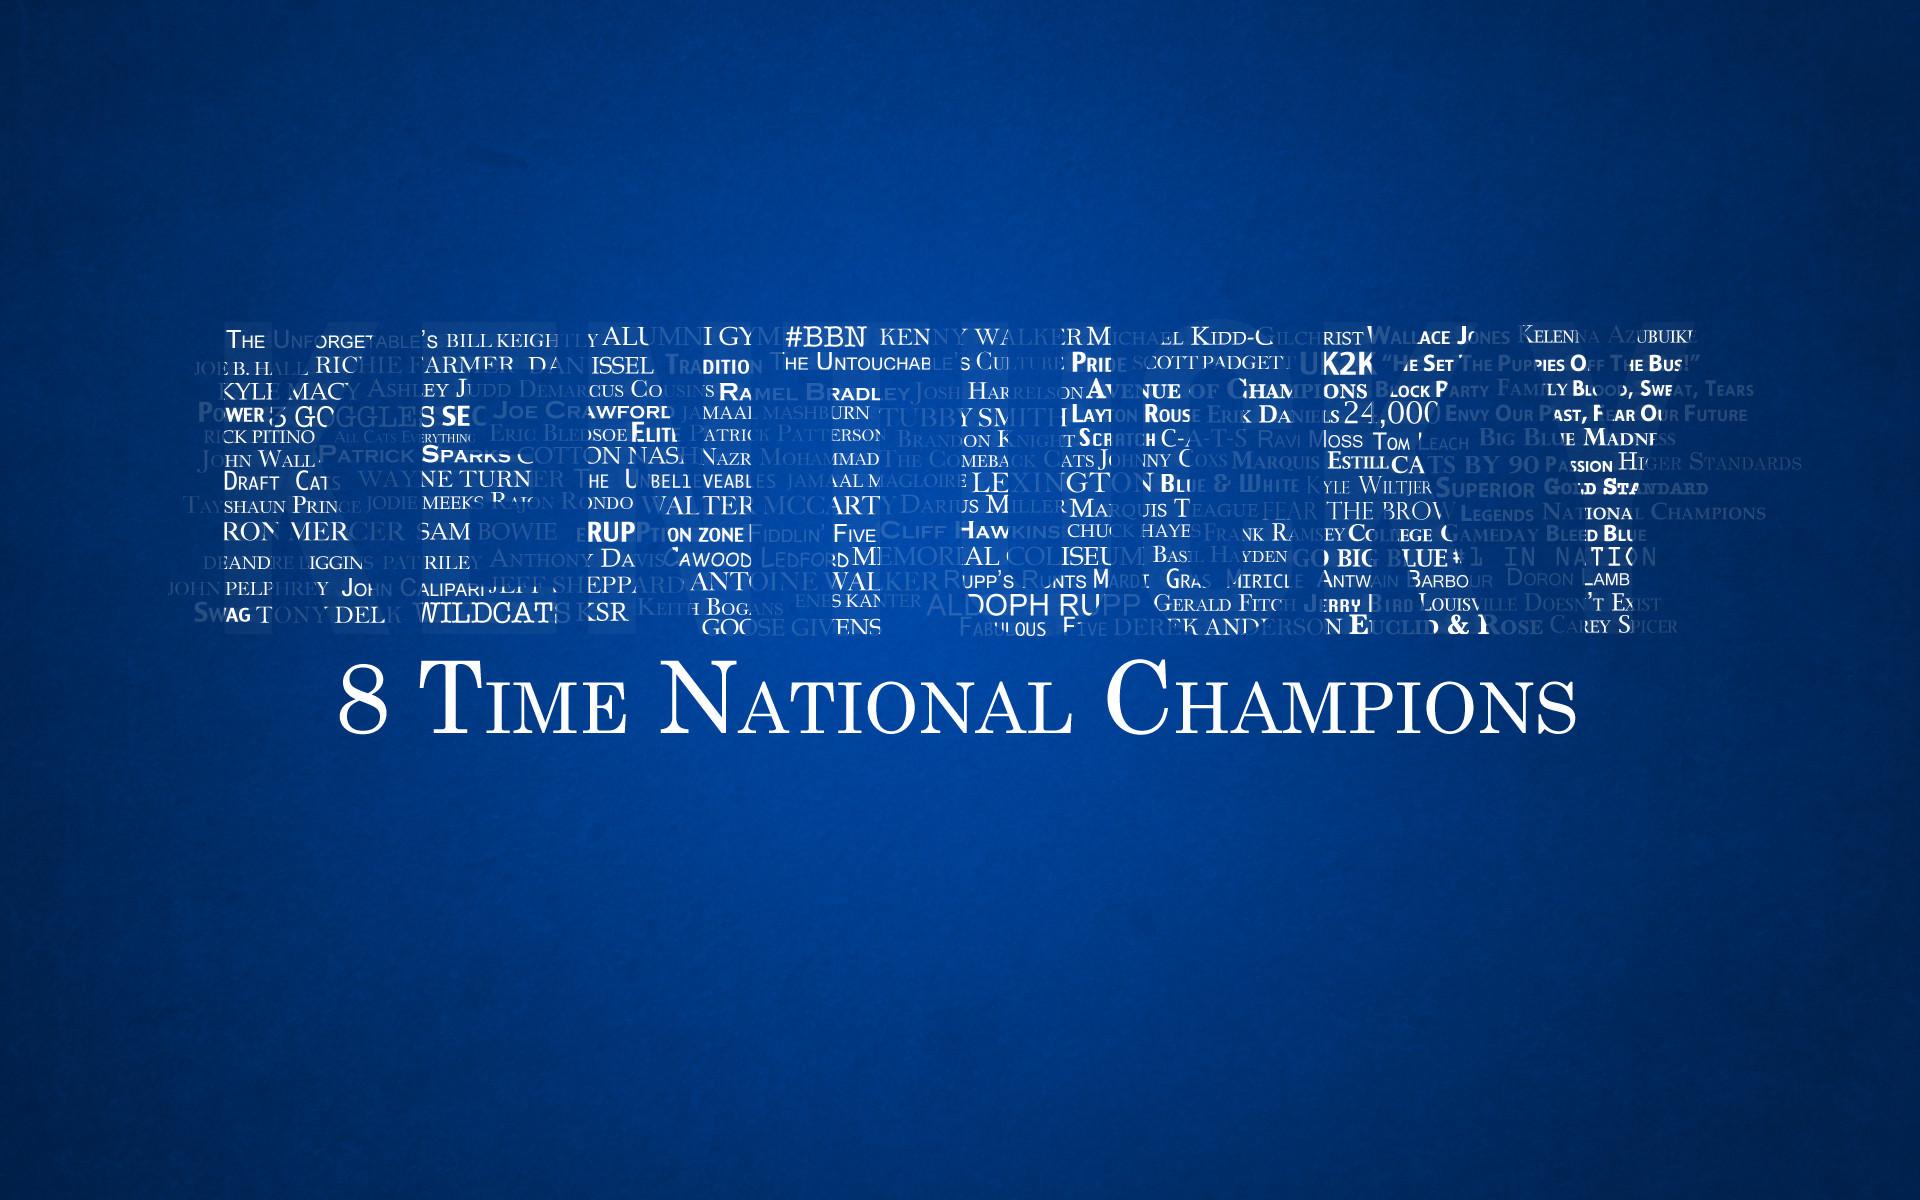 FunMozar – Kentucky Wildcats Basketball Wallpapers